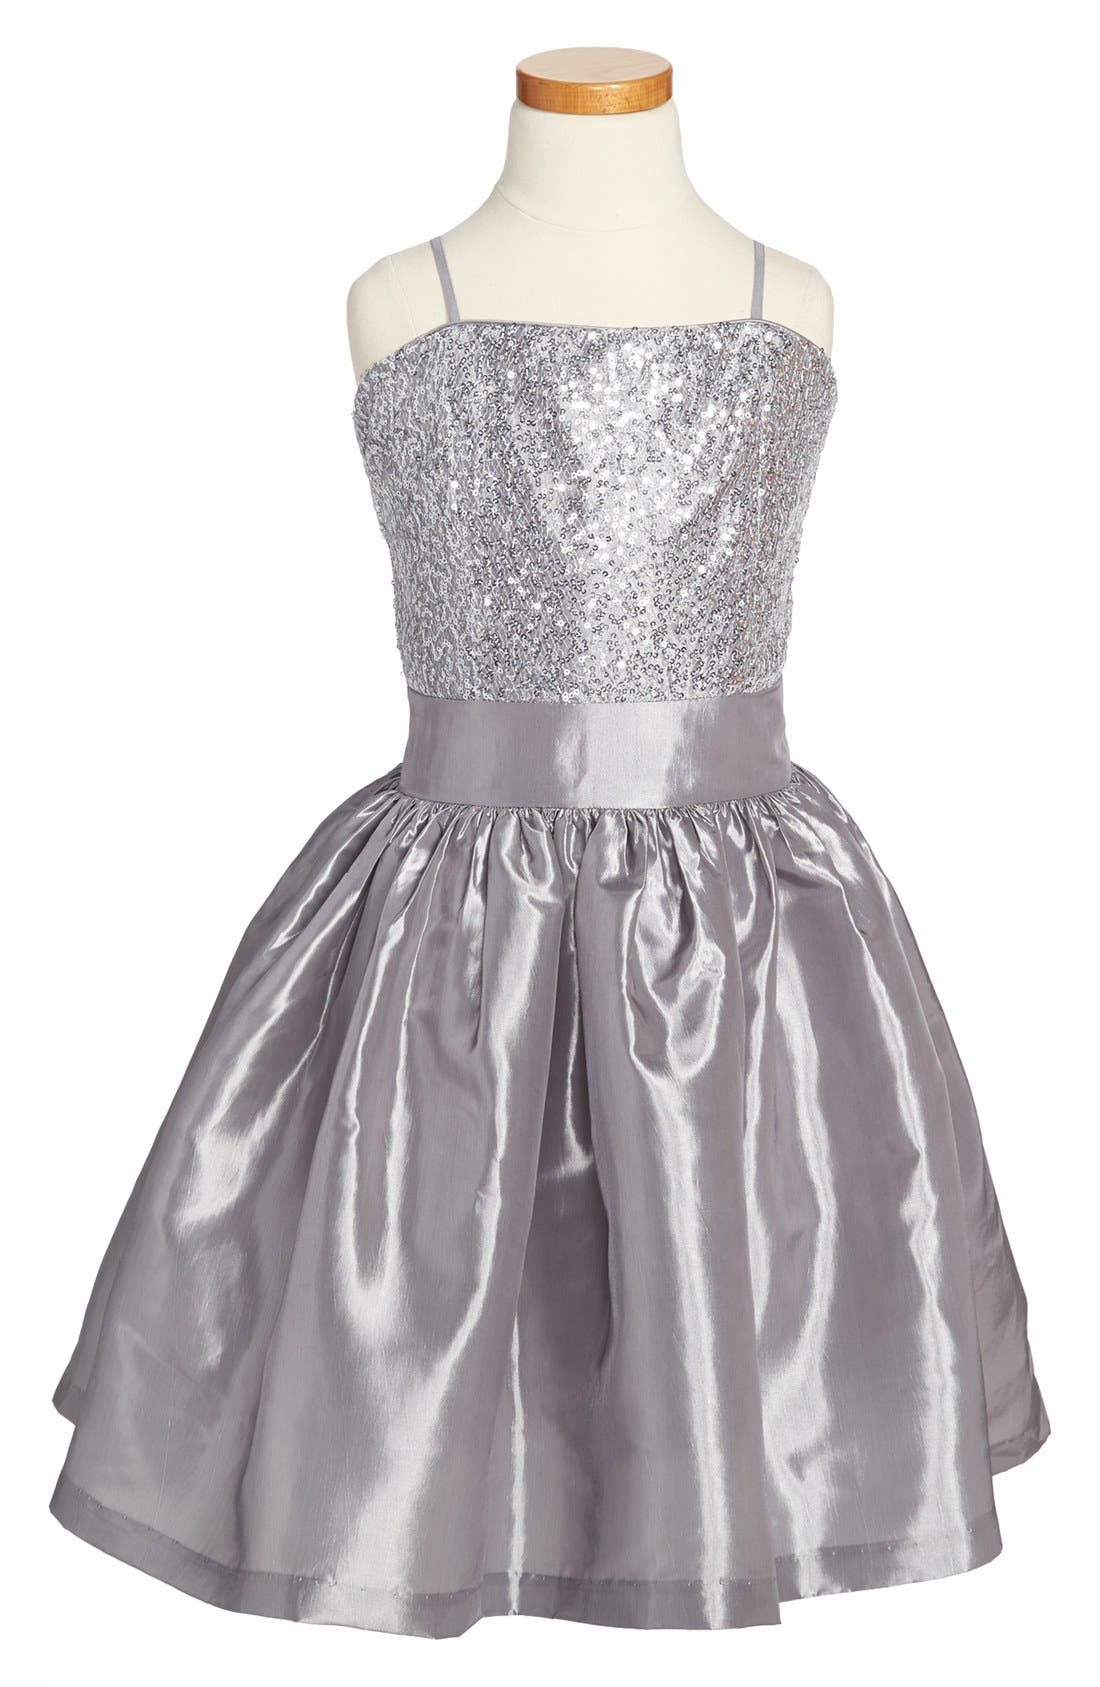 Main Image - Un Deux Trois Sequin Taffeta Dress (Big Girls)